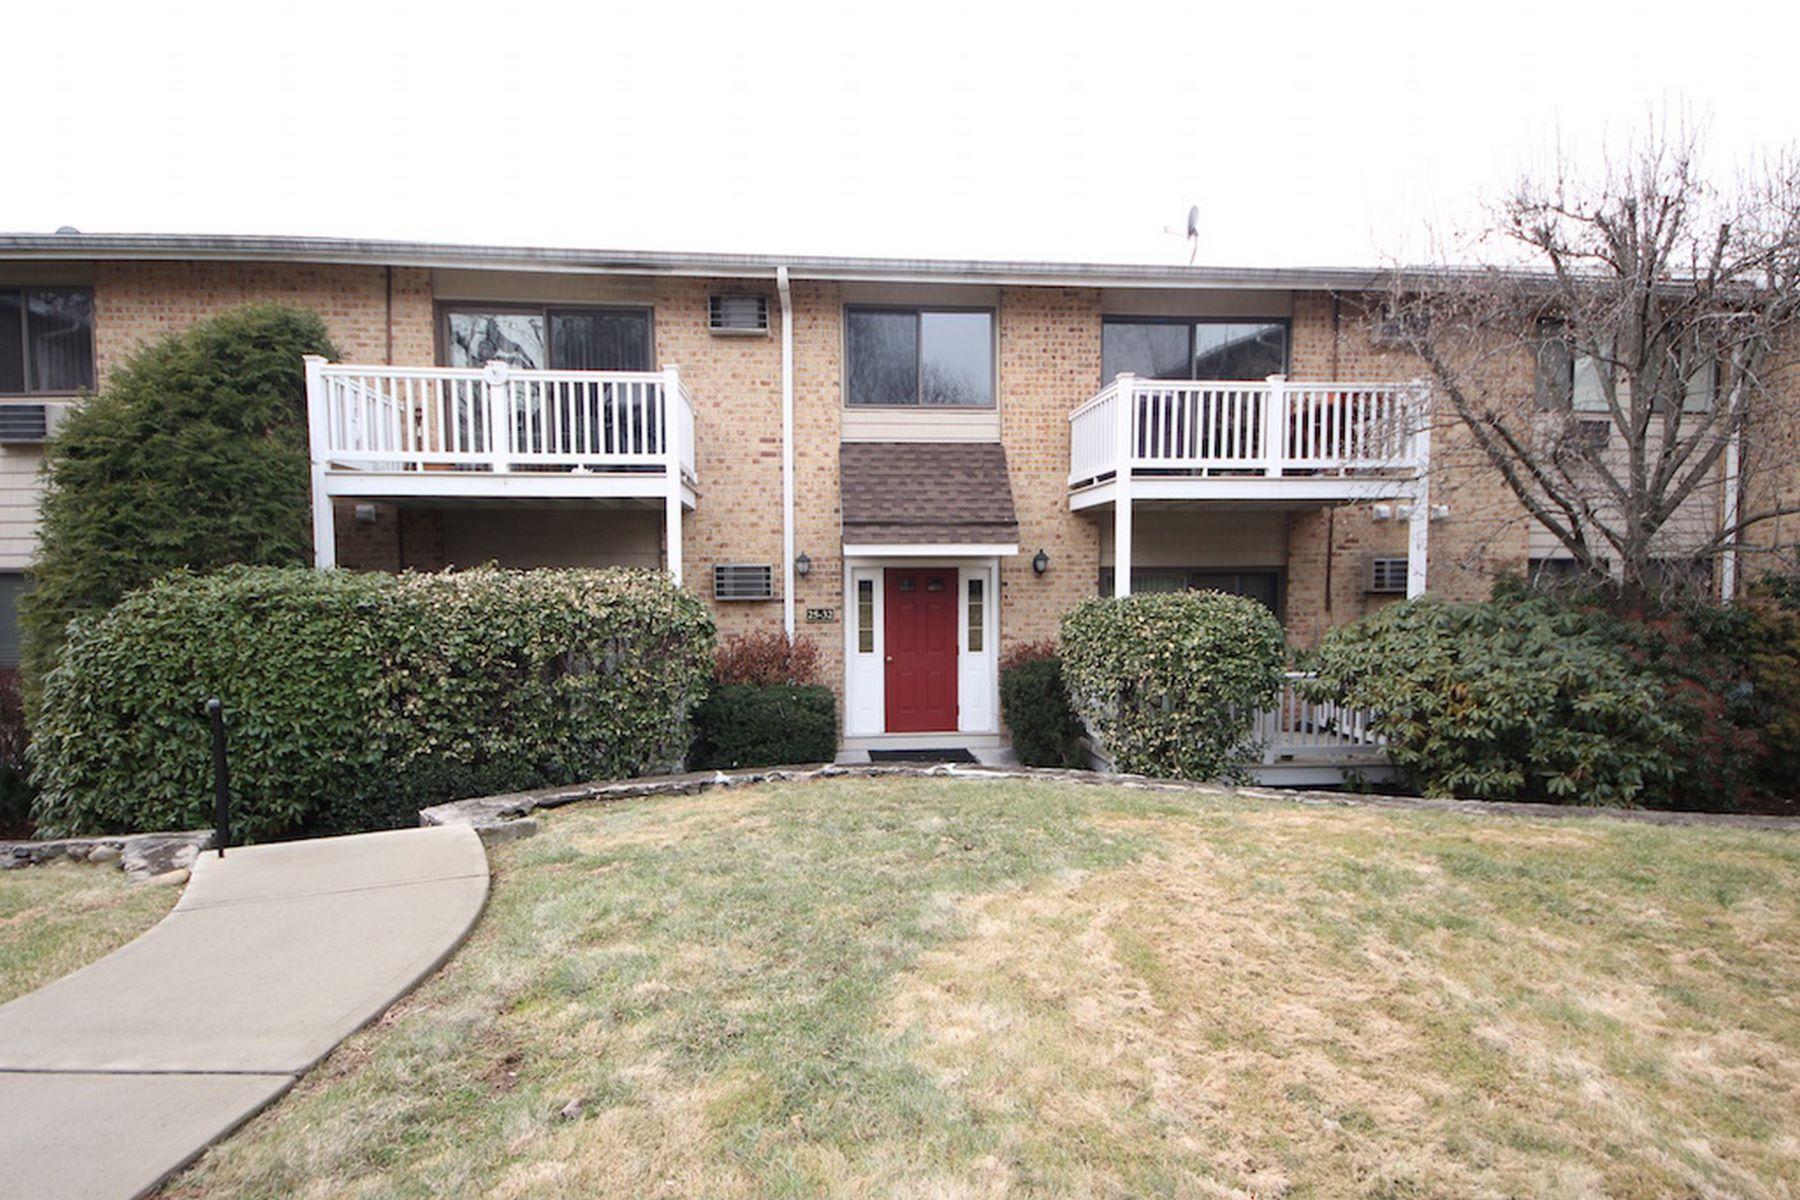 شقة بعمارة للـ Sale في Glenview Terrace 180 Glenbrook Road 28, Stamford, Connecticut, 06902 United States